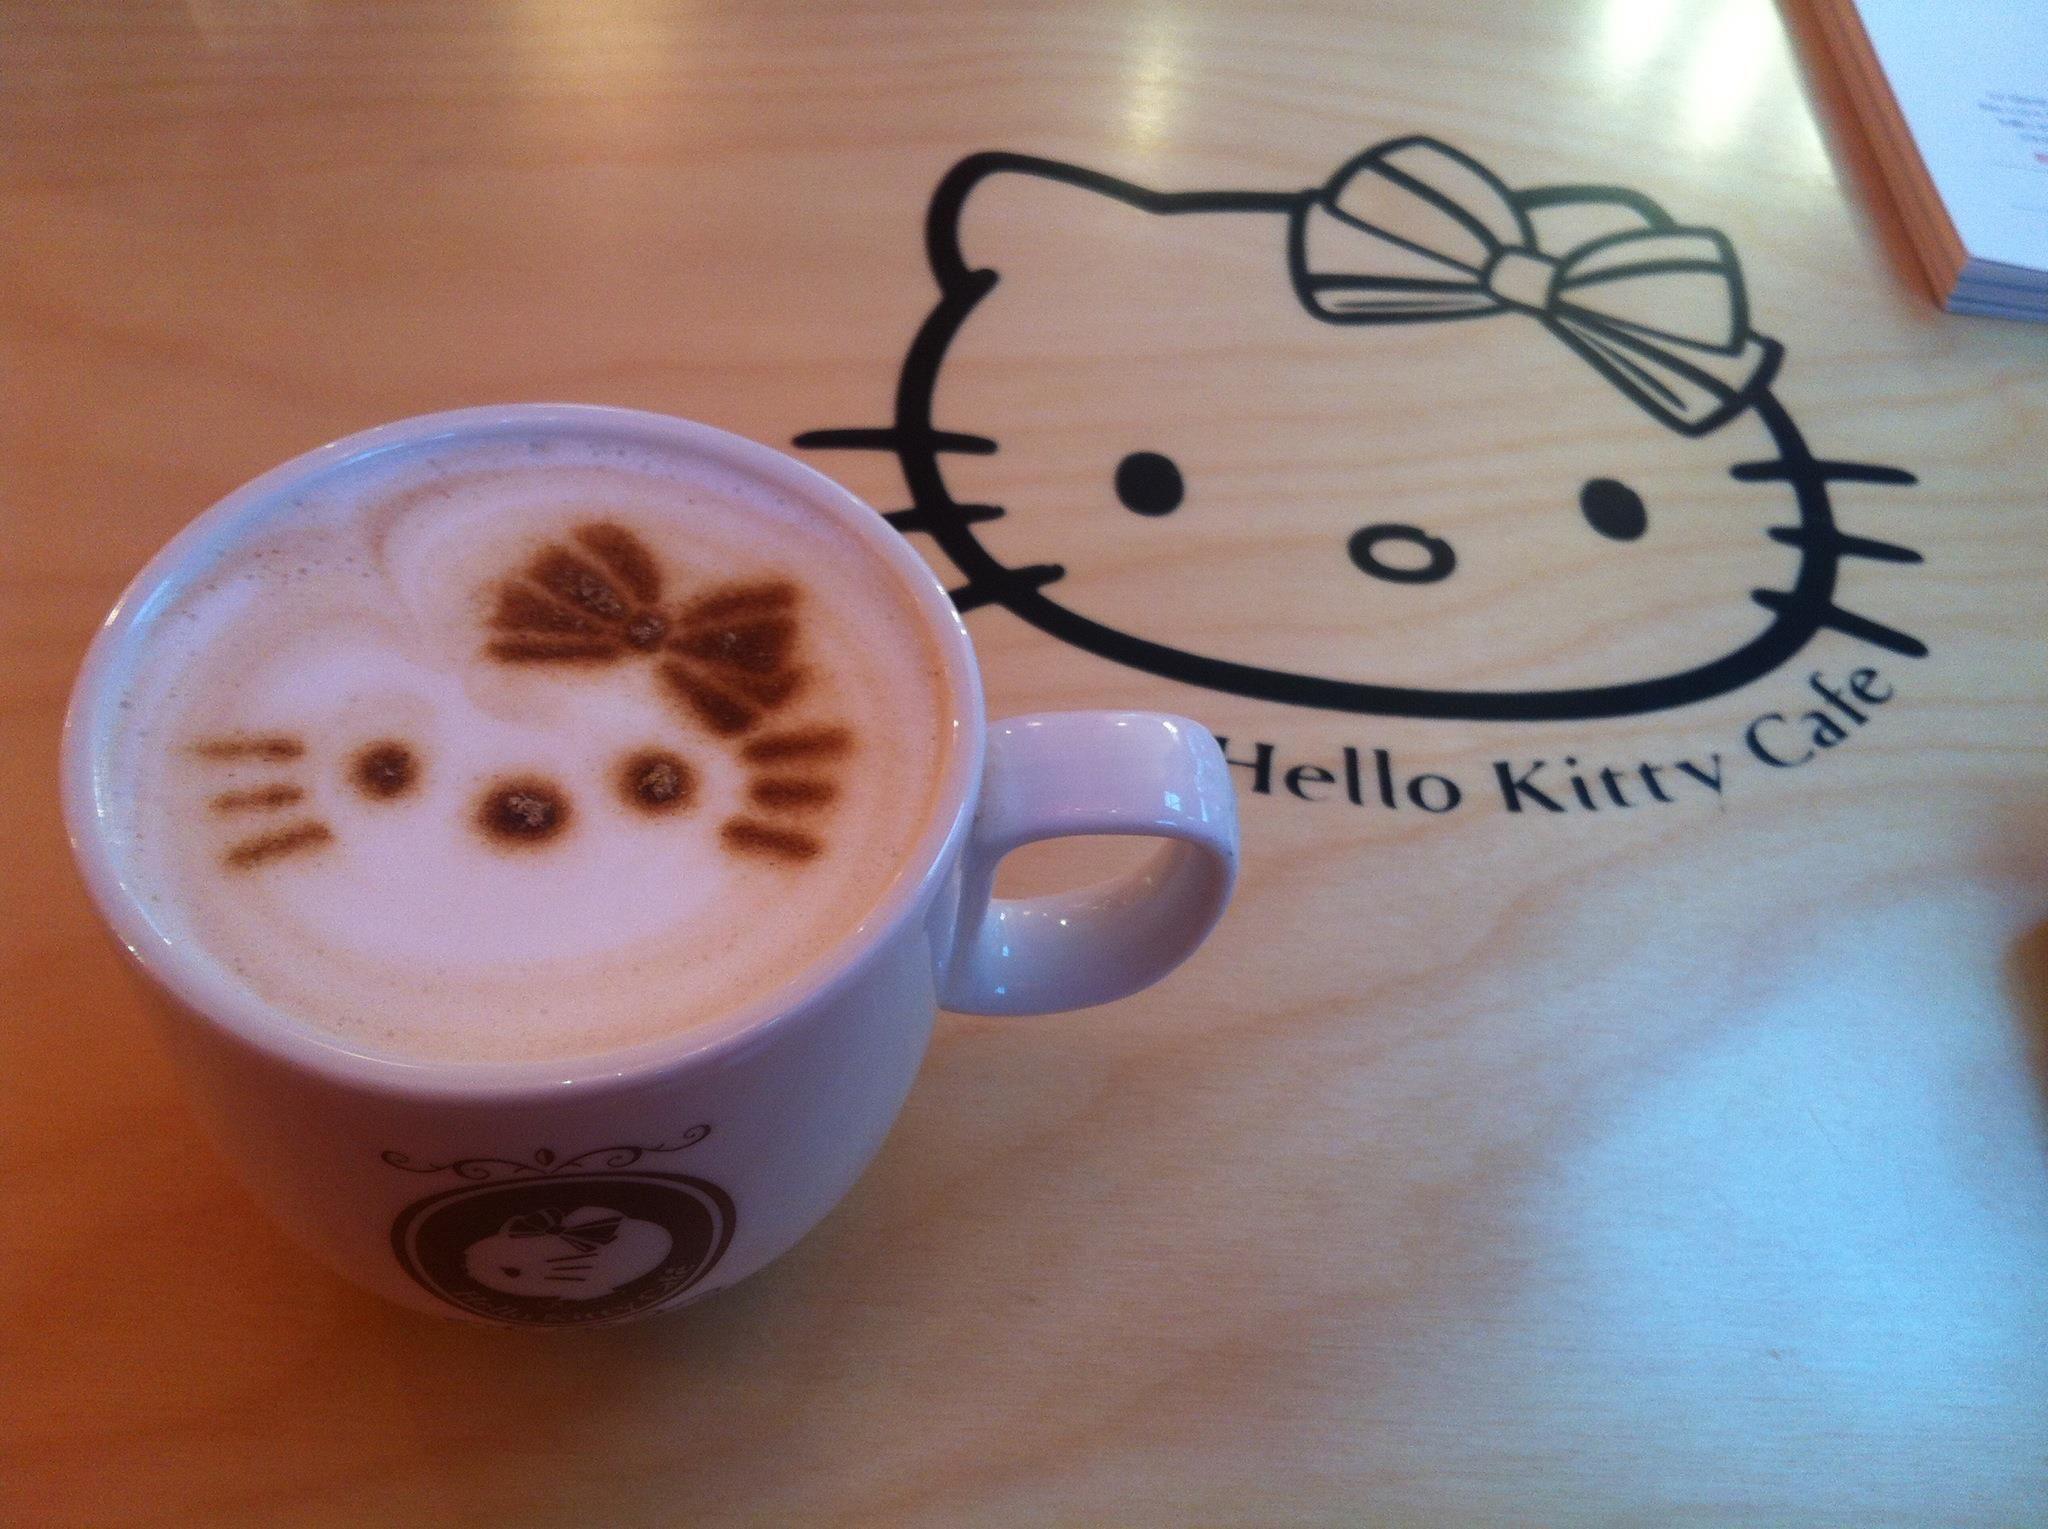 Cappuccino with hellokitty foam please cappuccino